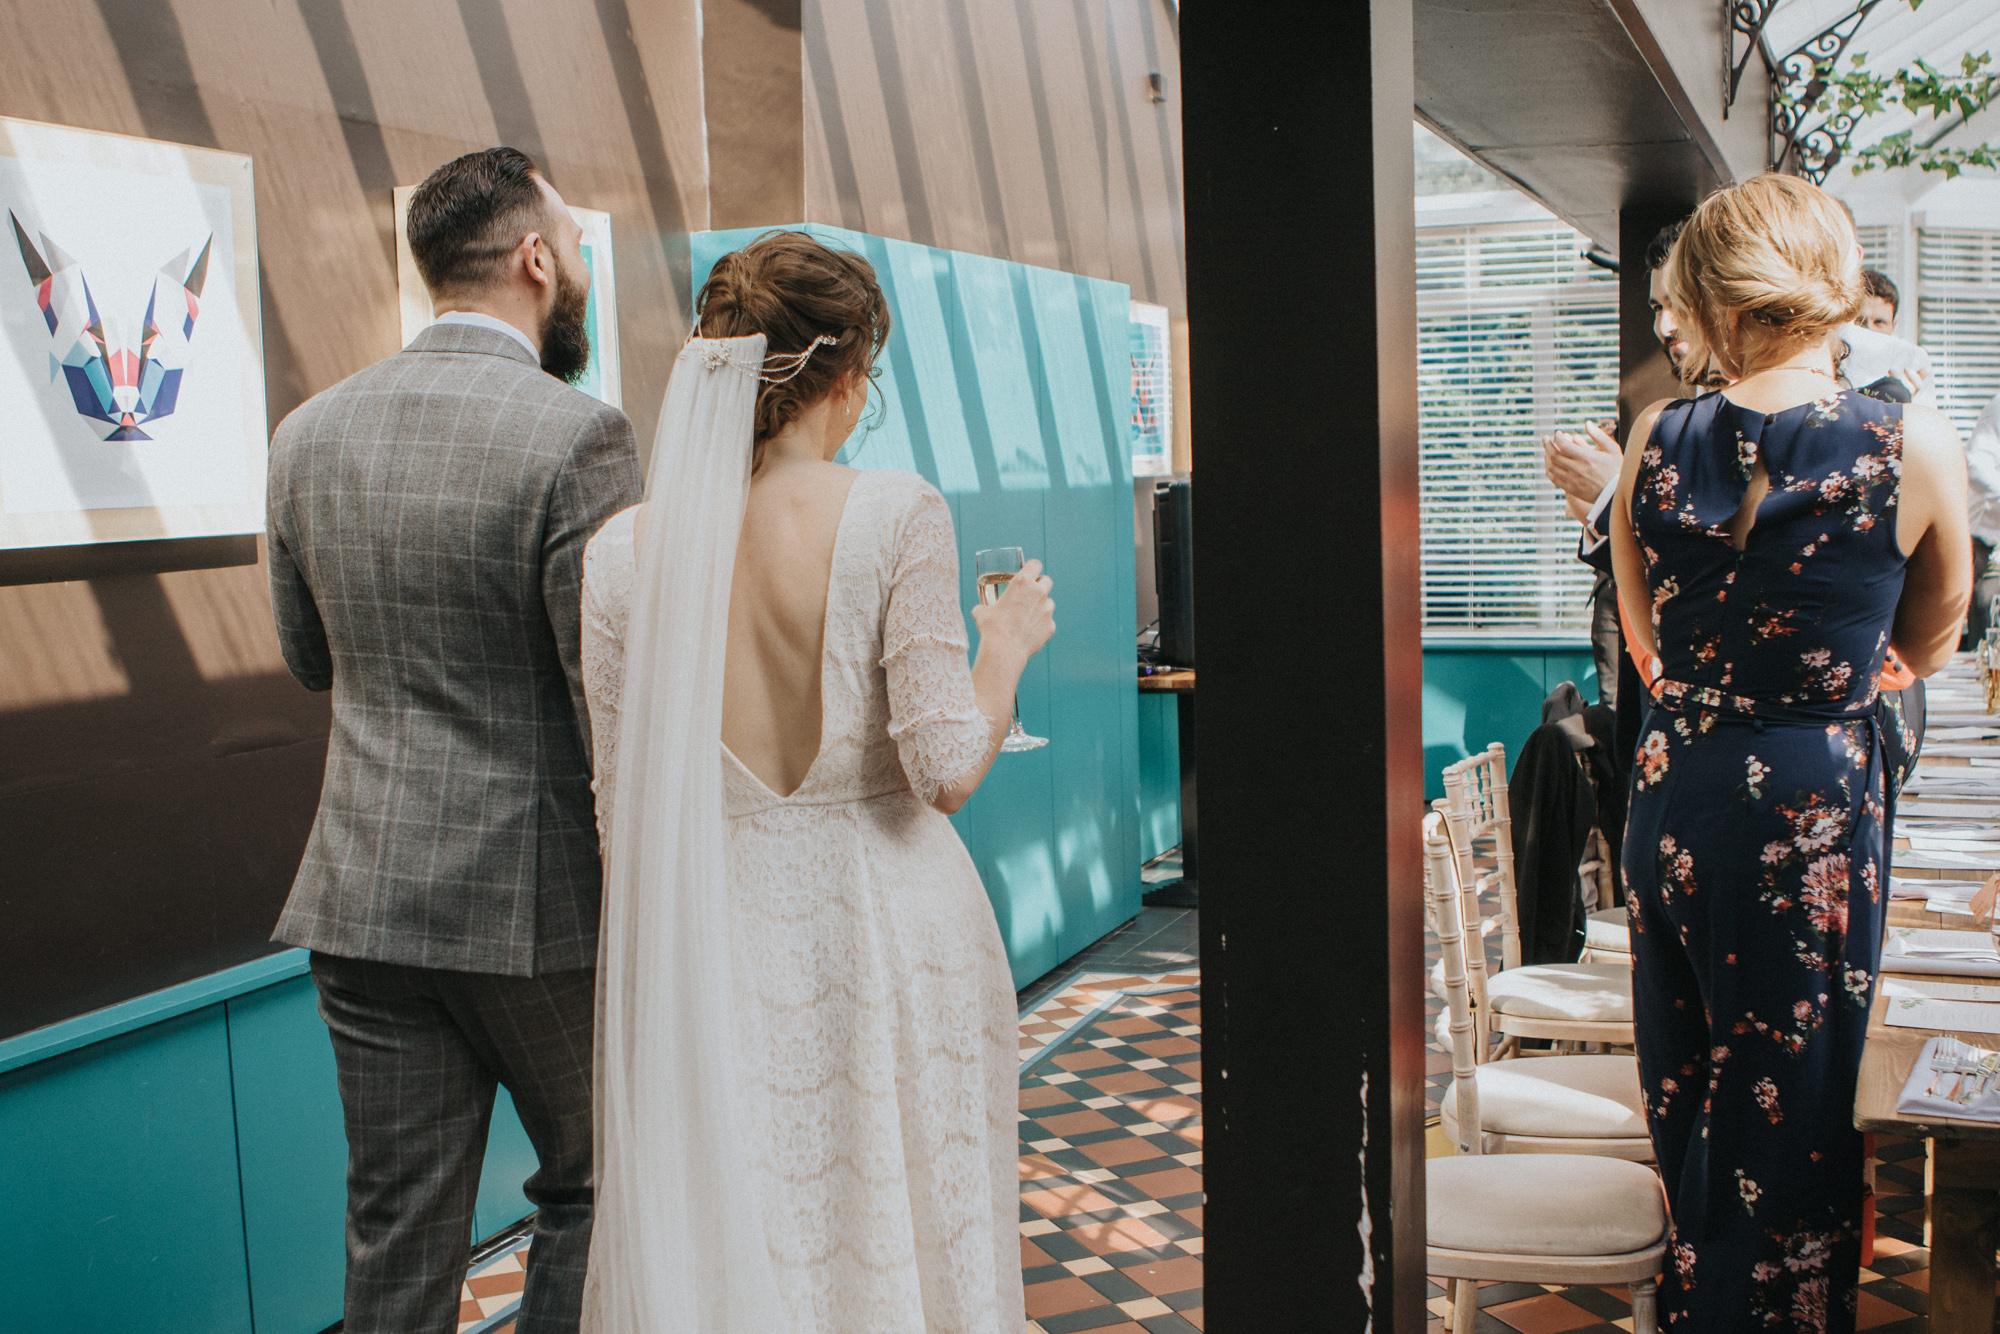 Kate-Beaumont-Lace-Flared-Dahlia-Gown-Leeds-Wedding-Bloom-Weddings-47.jpg